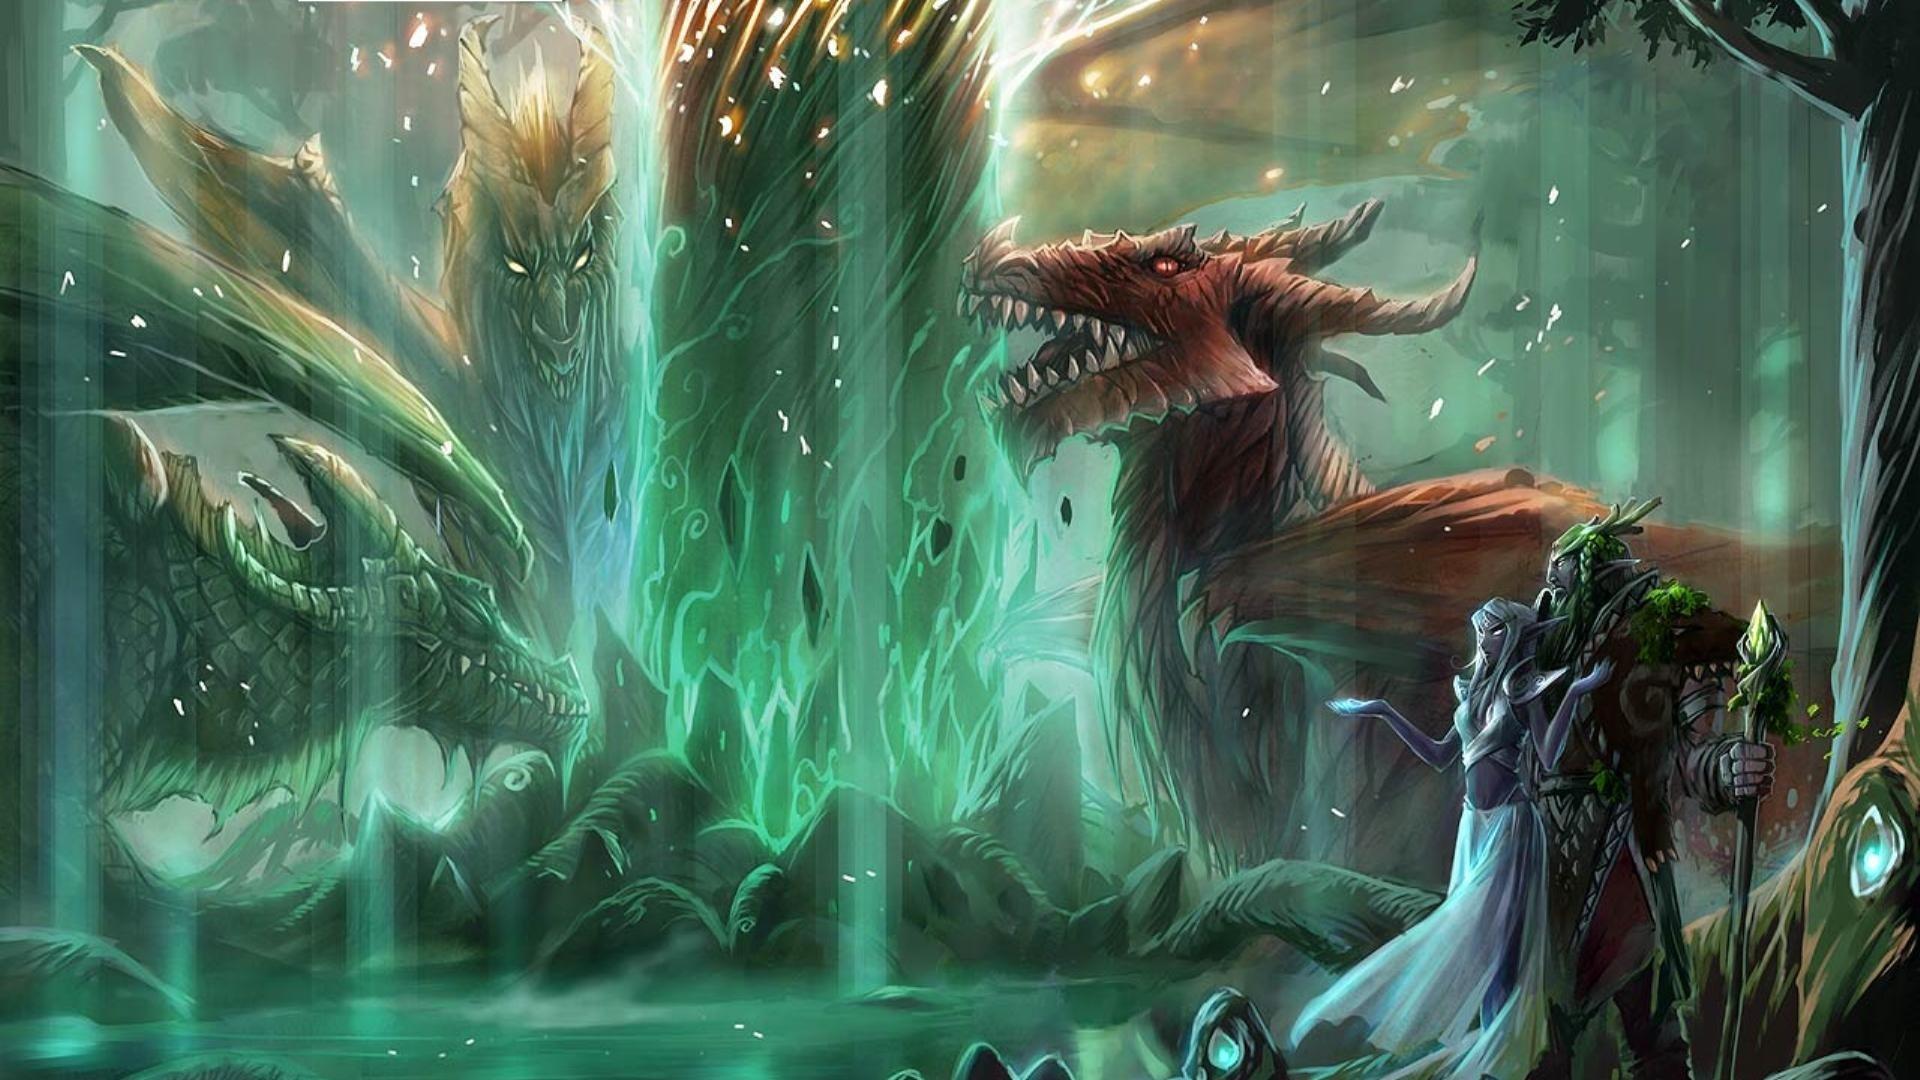 World Of Warcraft Fond d'écran HD | Arrière-Plan | 1920x1080 | ID:396047 - Wallpaper Abyss